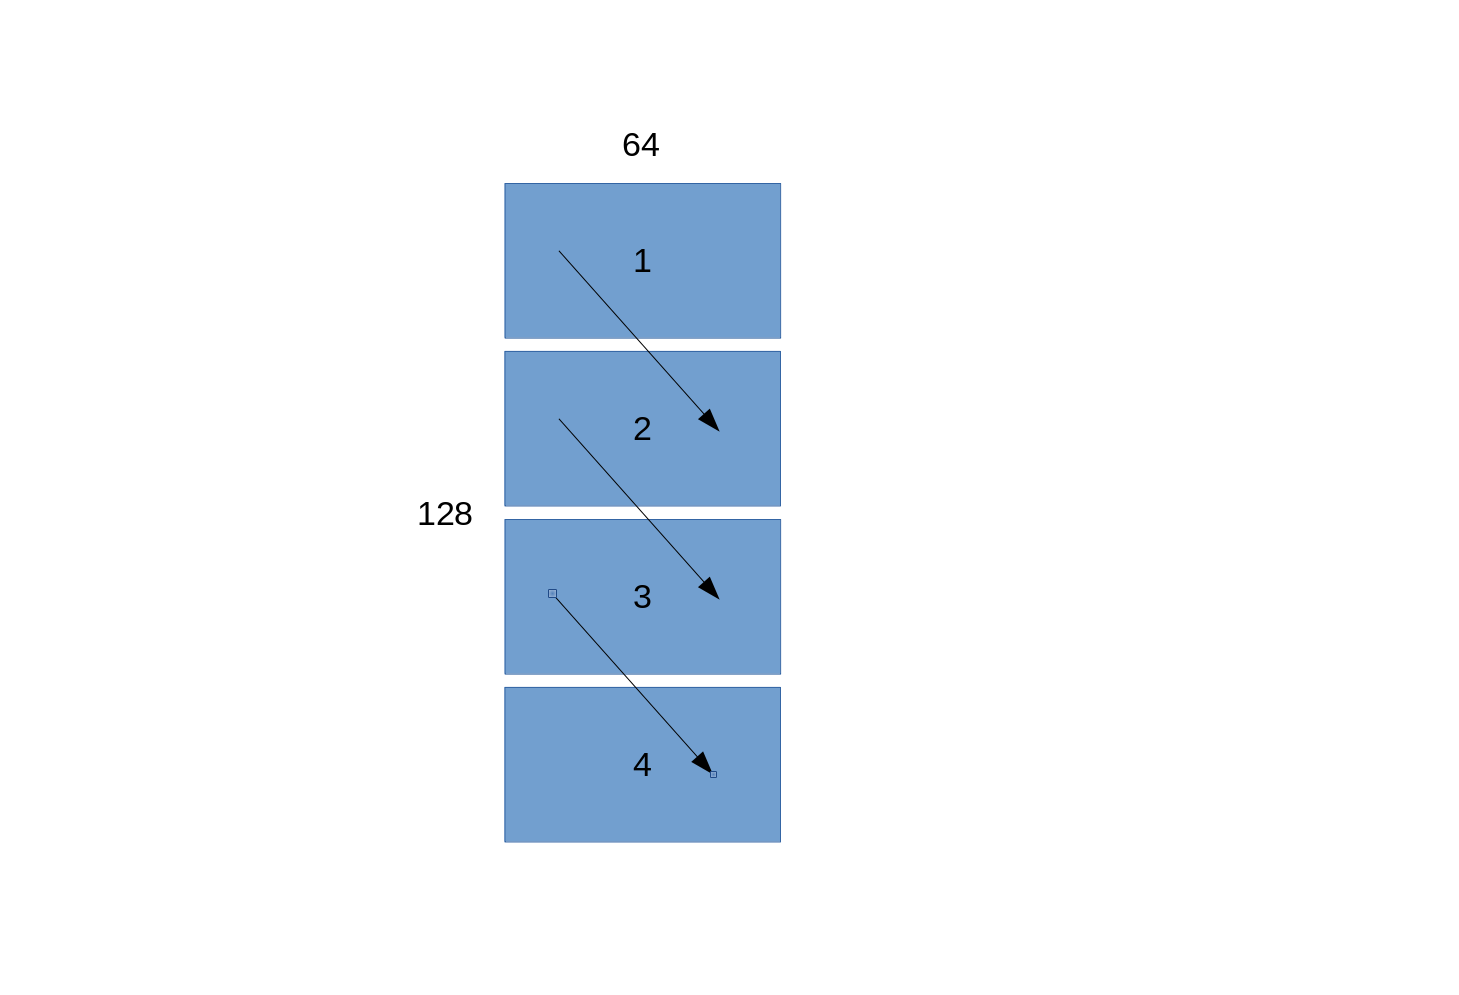 led_matrices_ksnip_20210128-121509.png